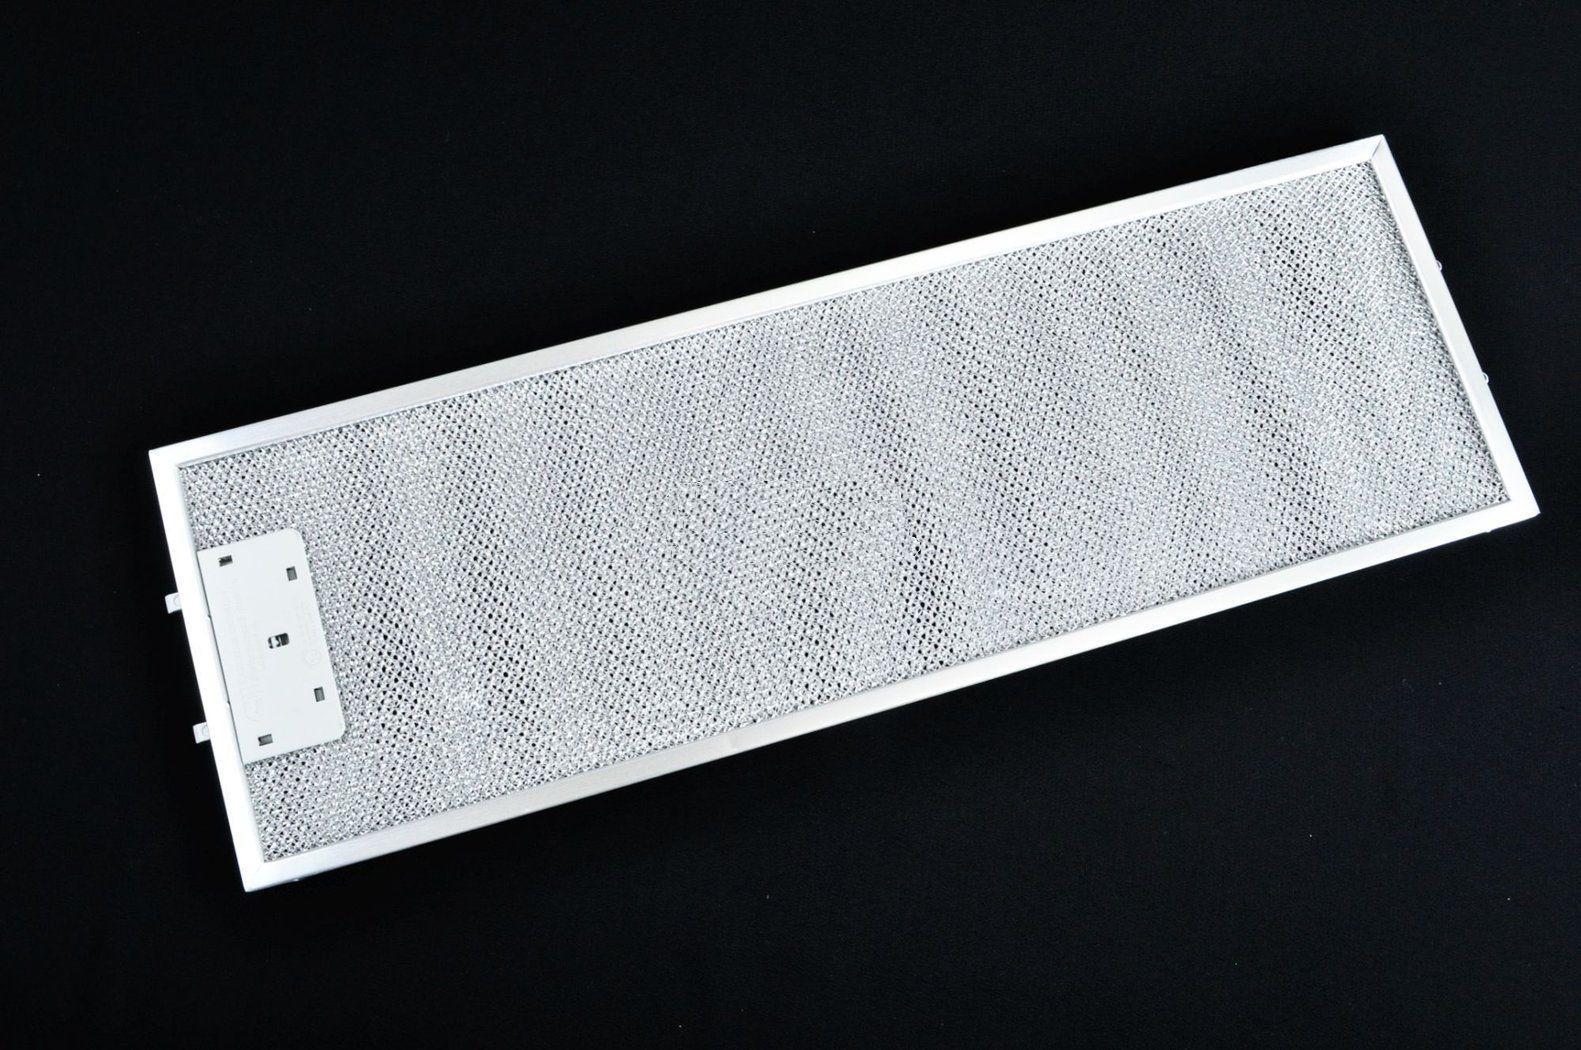 Ikea küche maximale höhe alu fettfilter dunstabzugshaube ikea